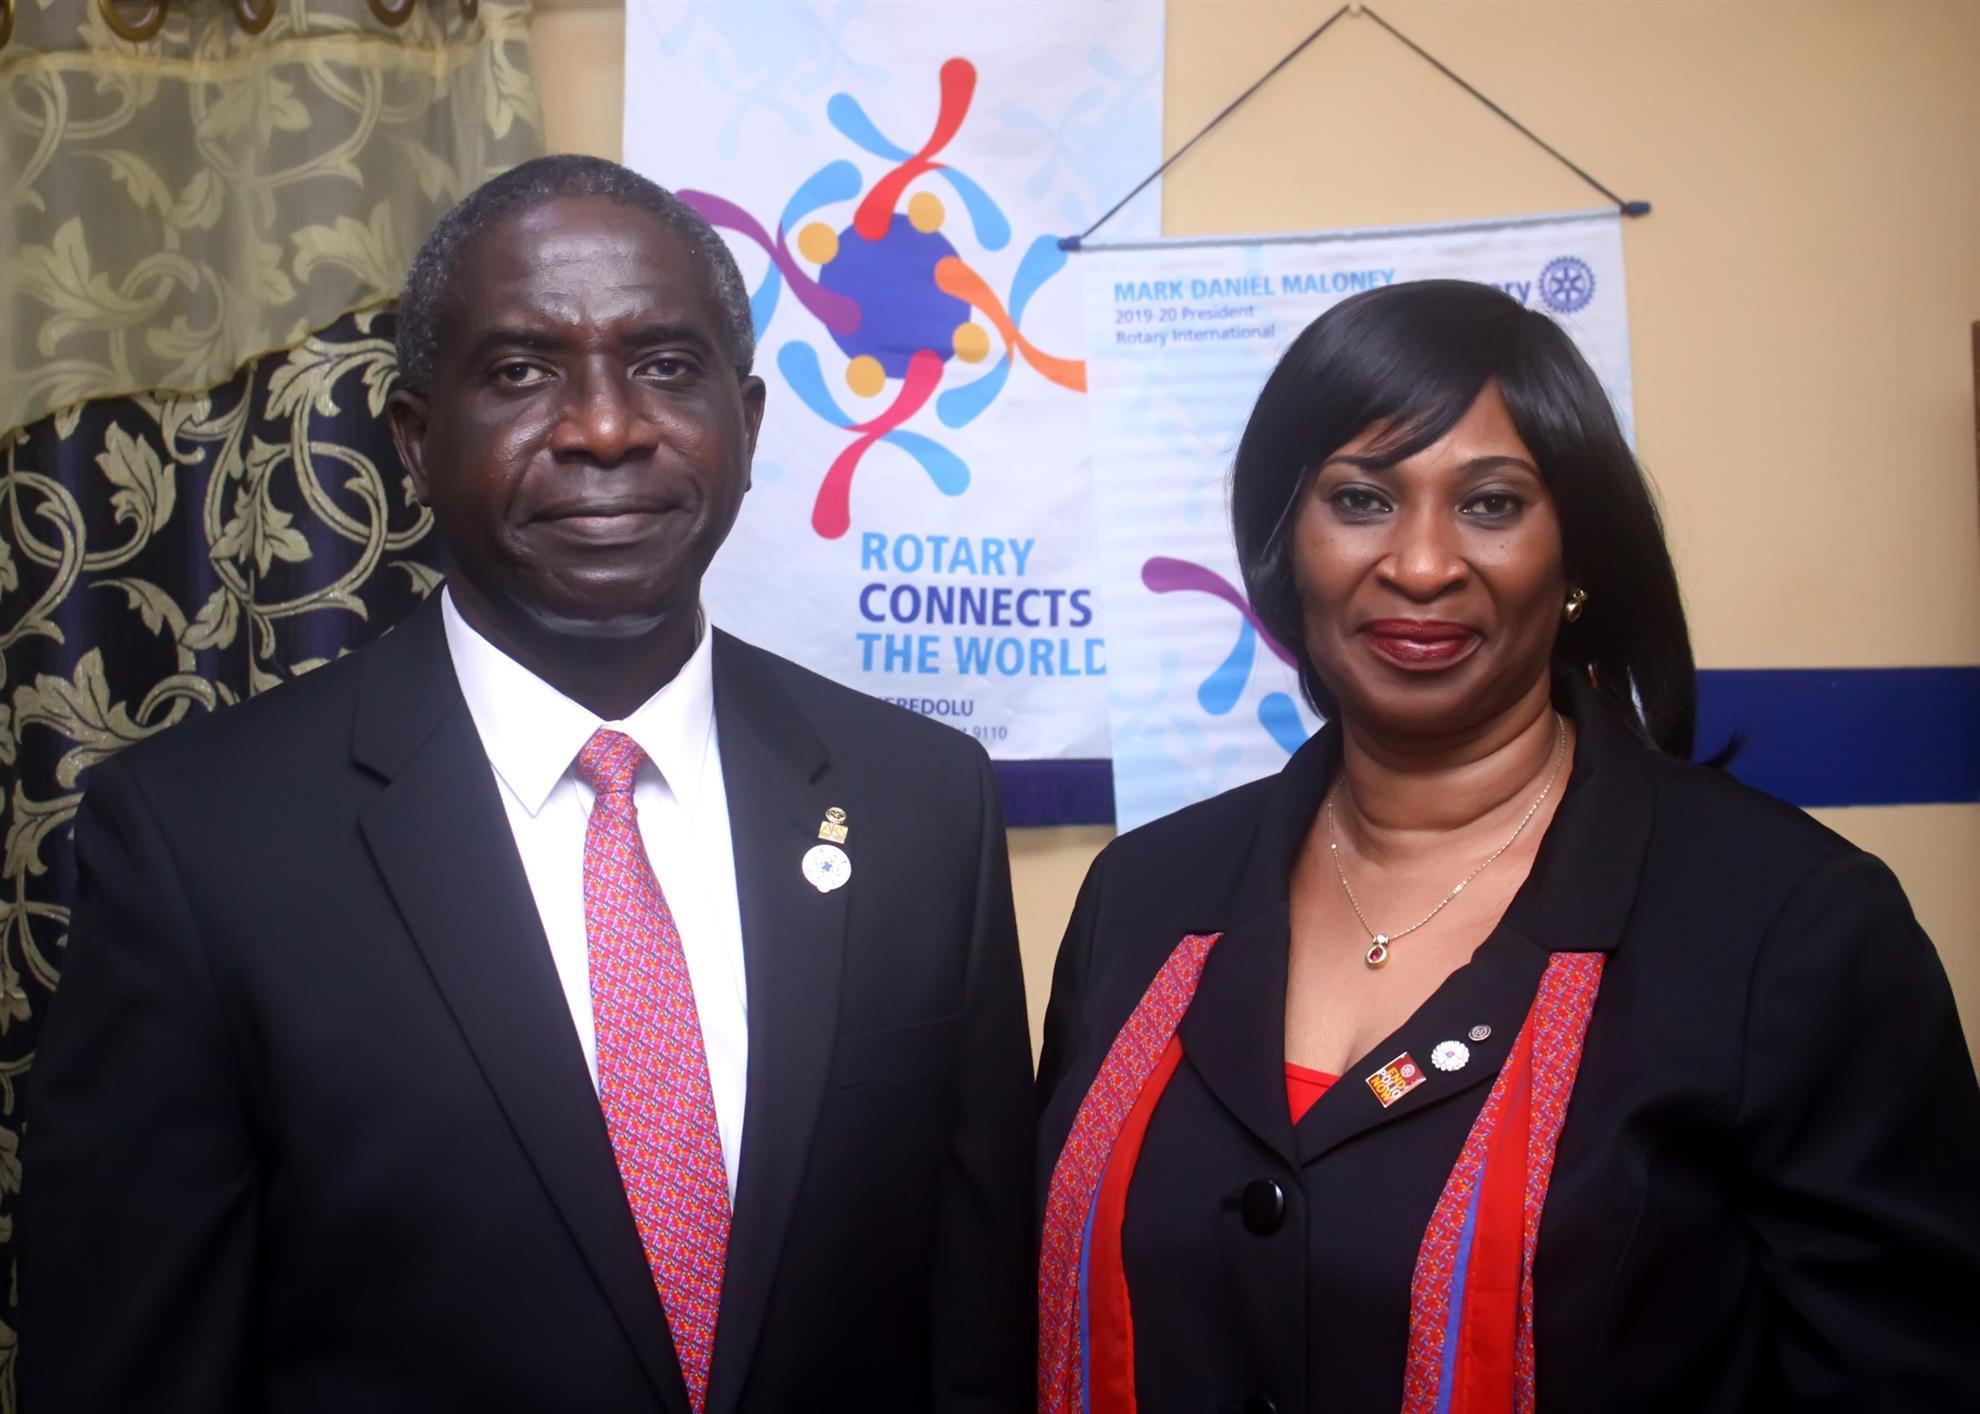 District Governor Jide Akeredolu and Spouse, Tokunbo